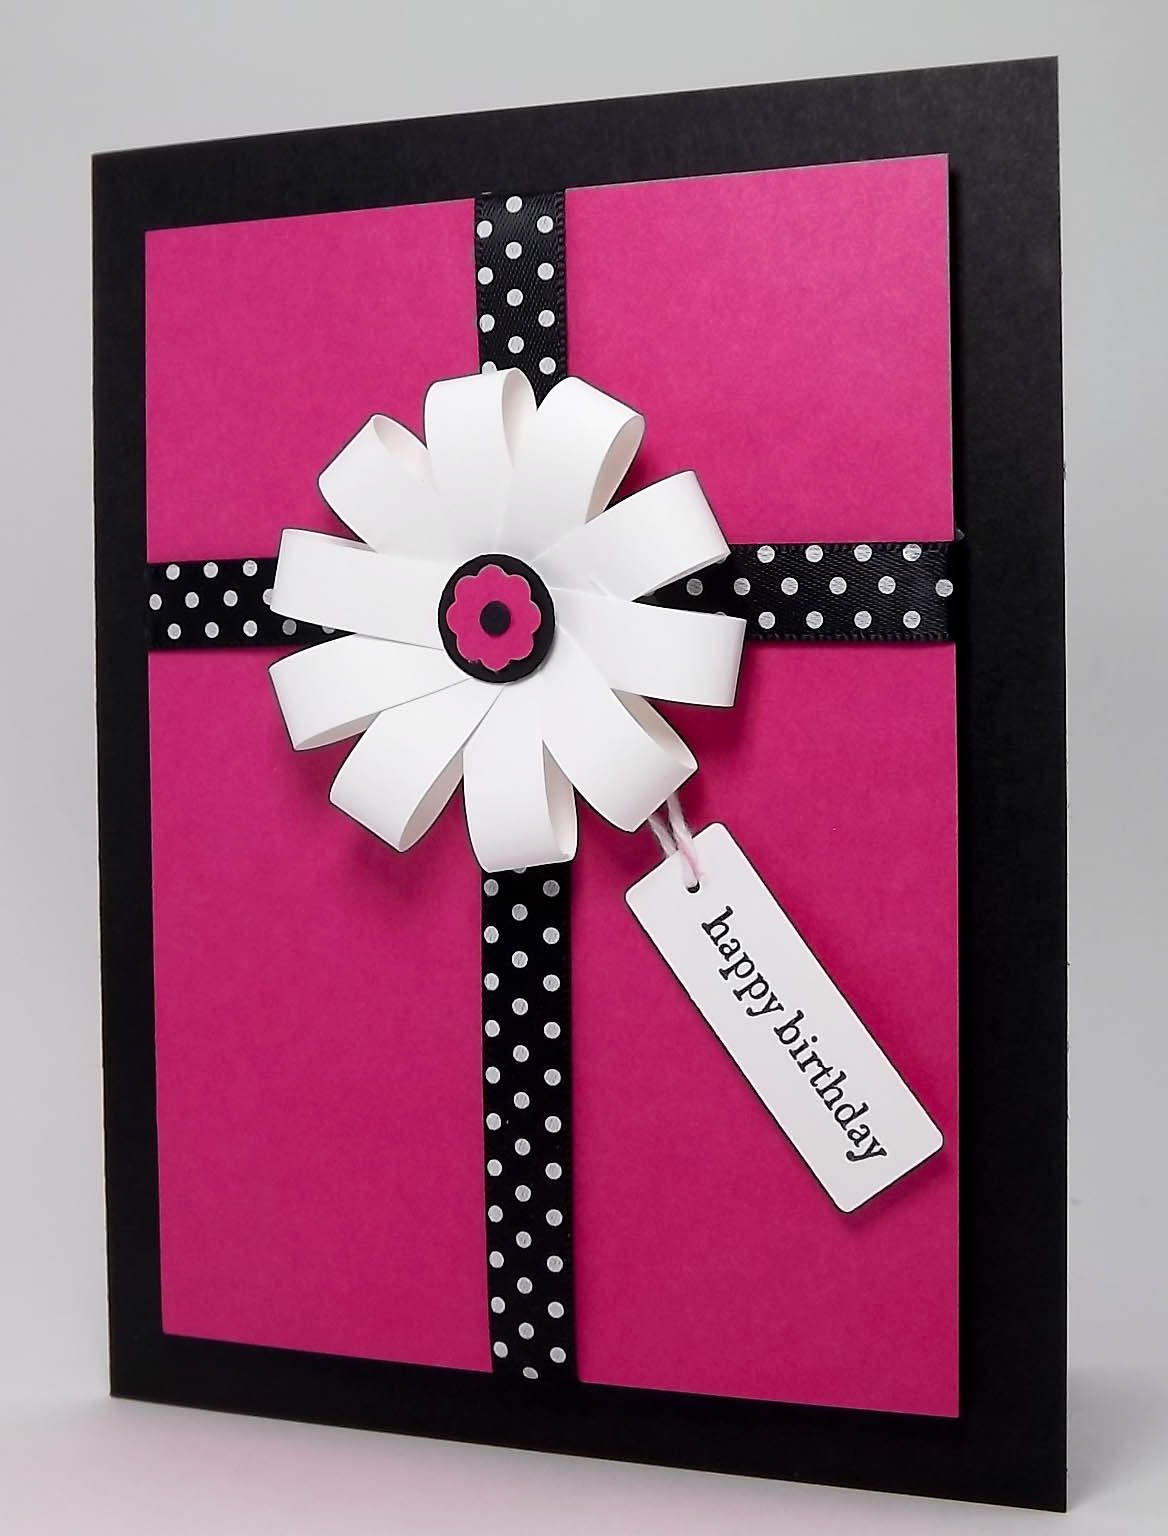 Happy birthday card fuchsia pink and blanc white colors really happy birthday card fuchsia pink and blanc white colors really graphic and simple kristyandbryce Images